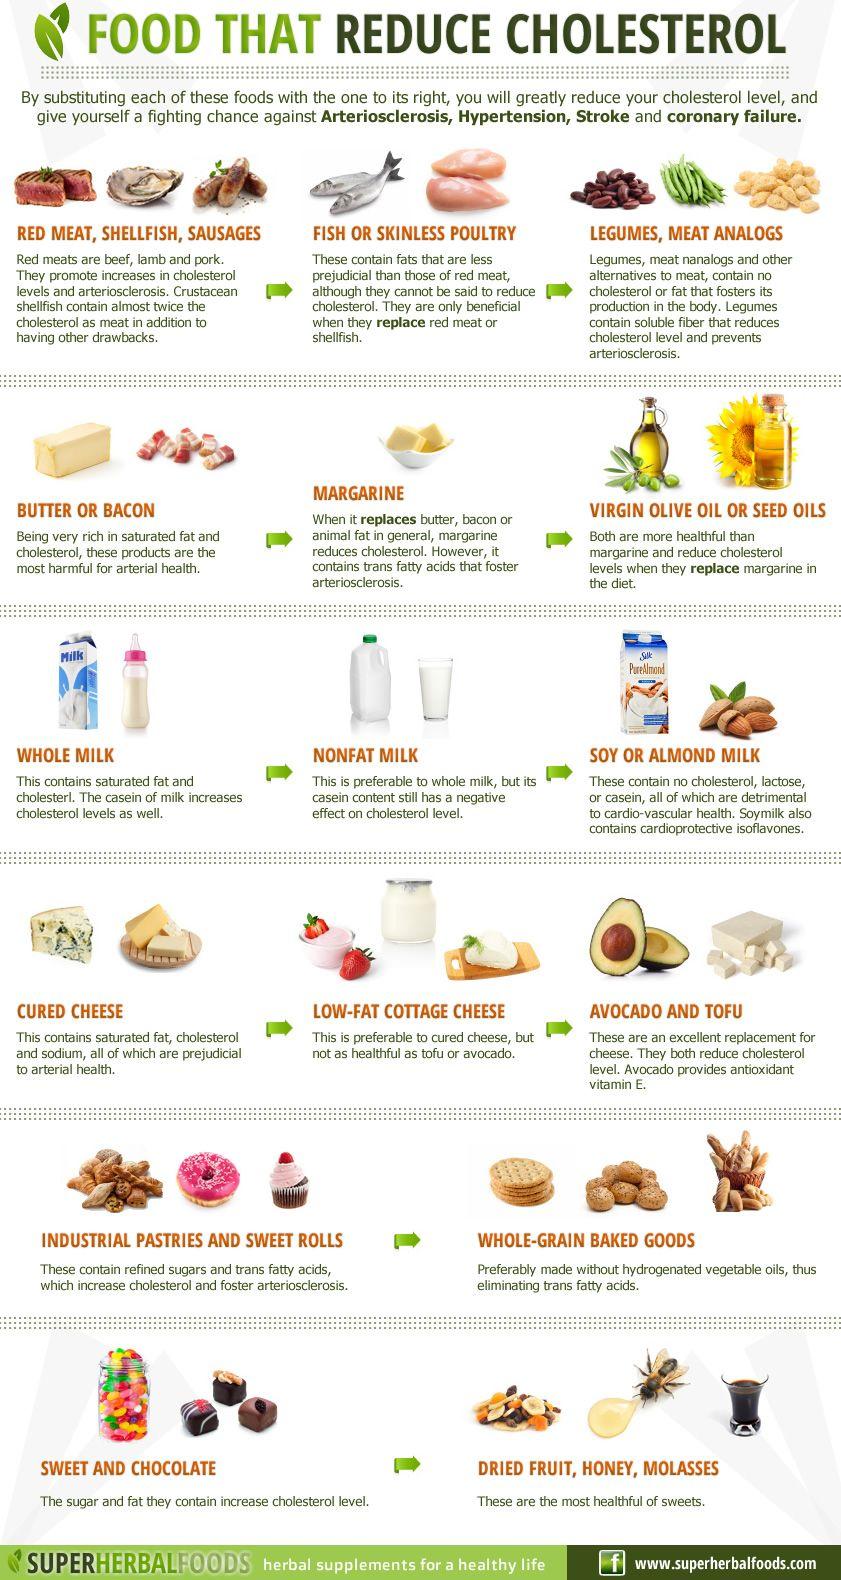 Super Herbal Foods Natural Remedies Food that reduce